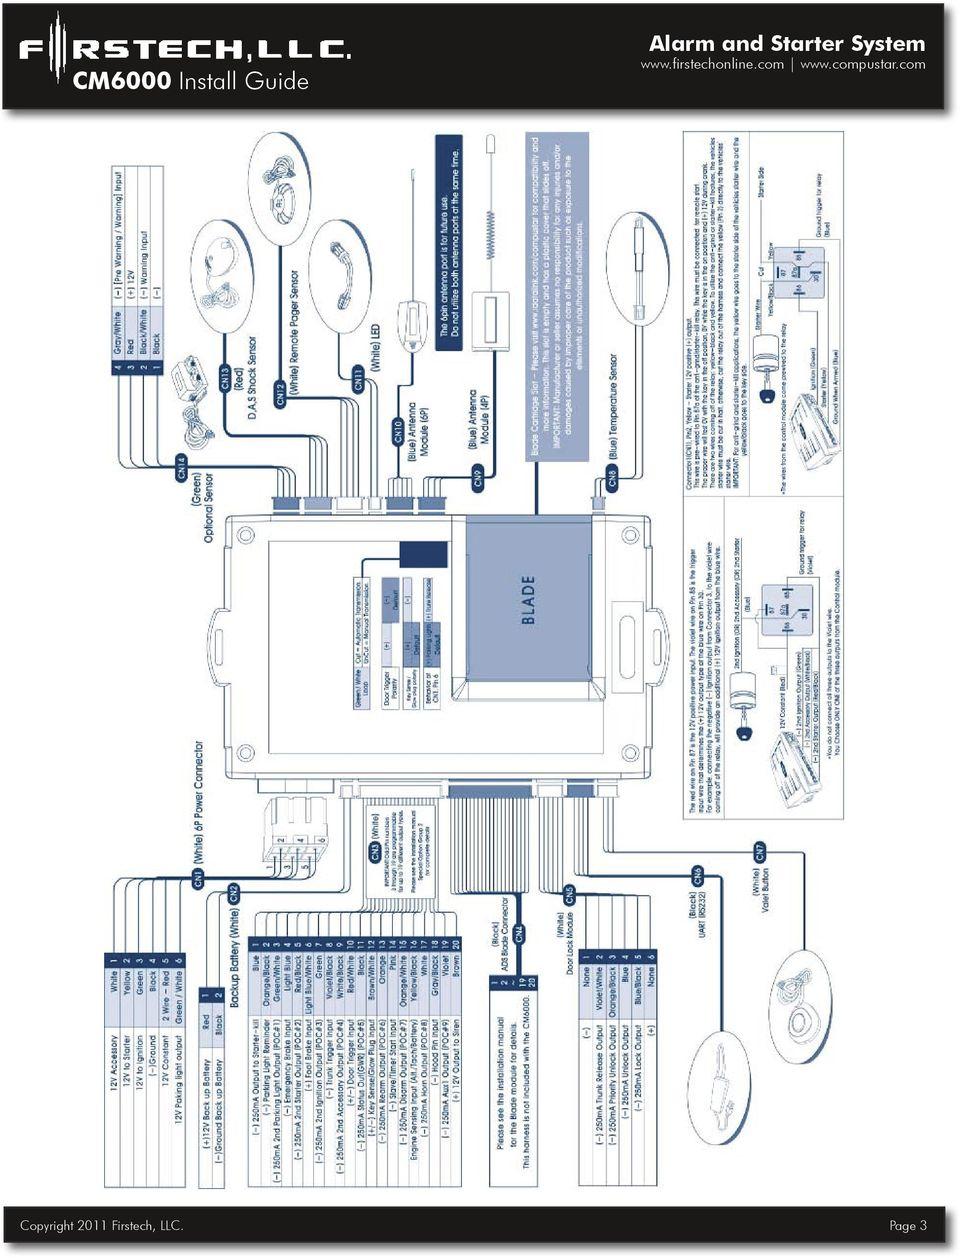 medium resolution of compustar wiring diagram wiring diagram compustar wiring diagram compustar wiring diagram